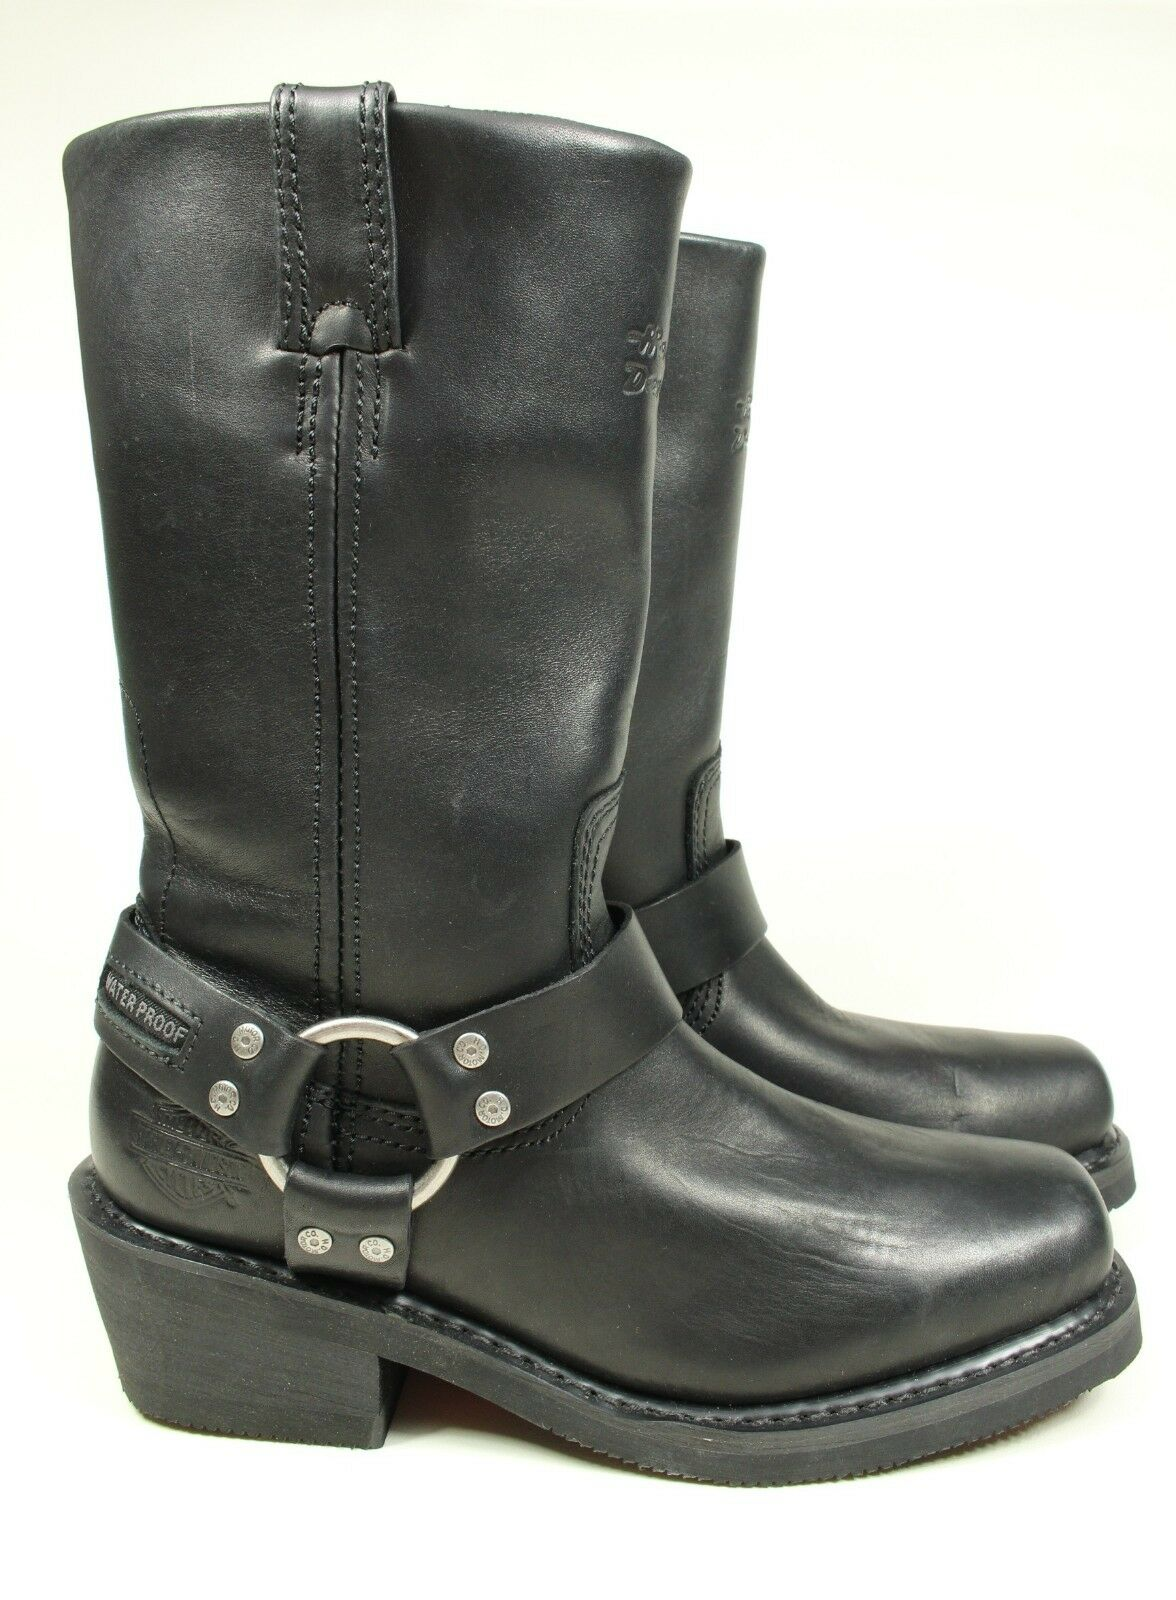 Nueva Harley-Davidson Hustin 86222 Negro Cuero Moto botas para mujer 7.5